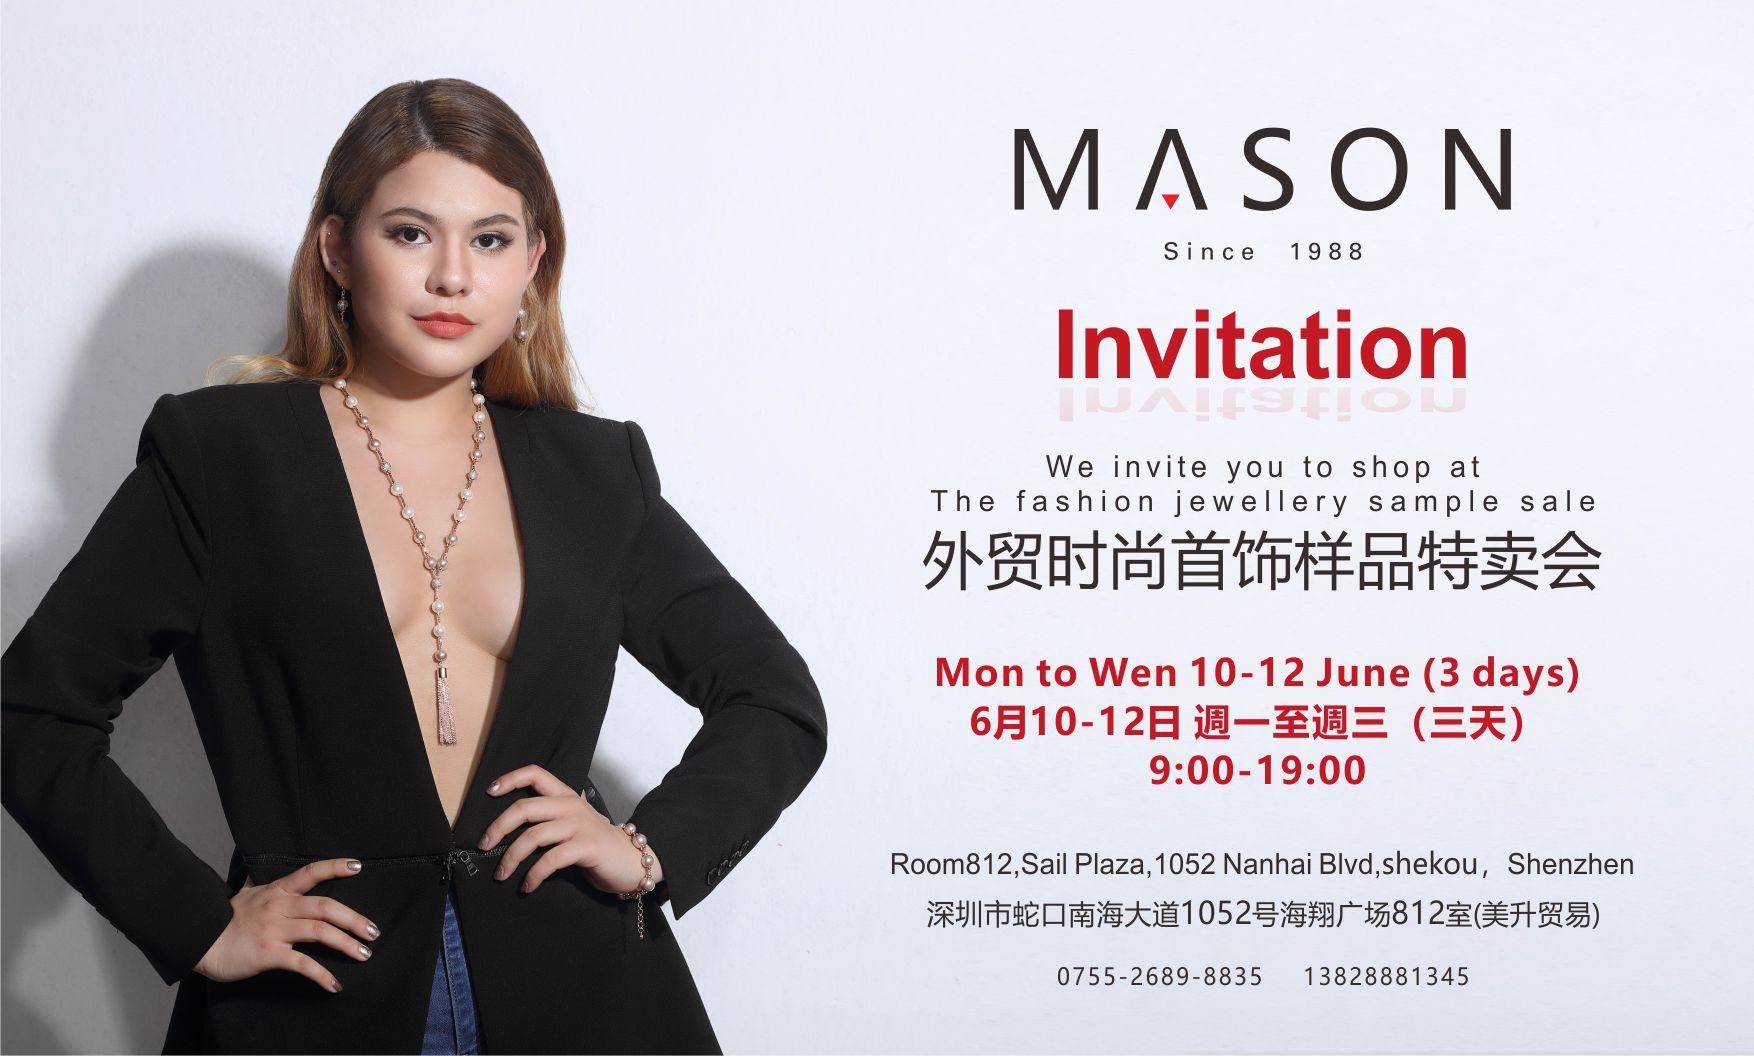 """MASON""(美升贸易) Jewelry Sample Sale! (June 10th - 12th)"